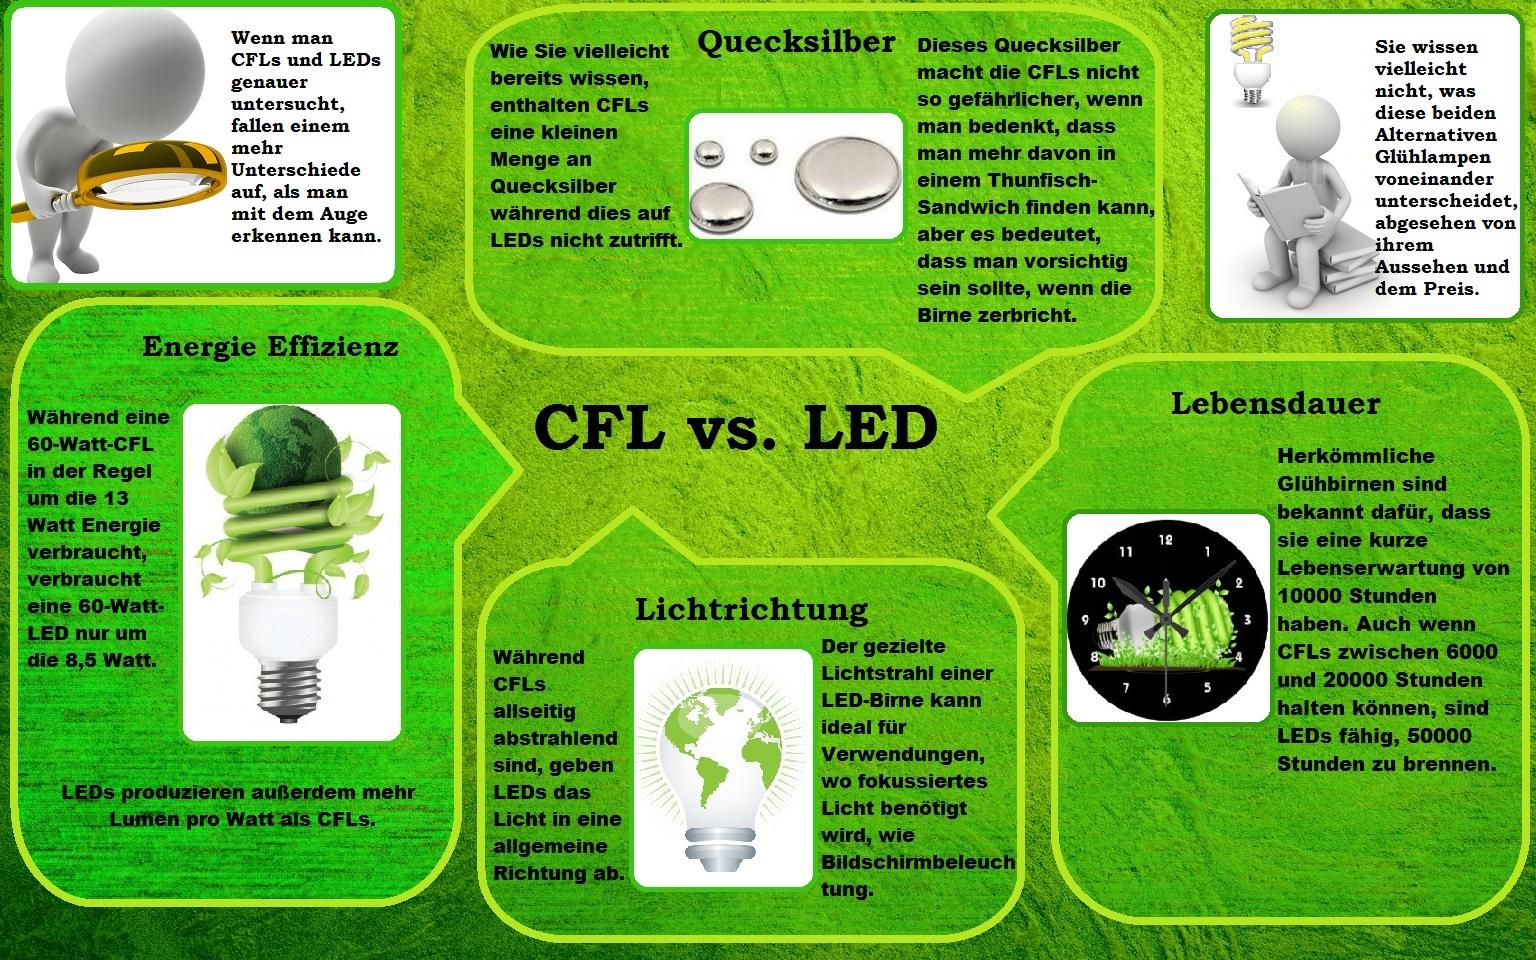 Infographic-cfl-vs-led